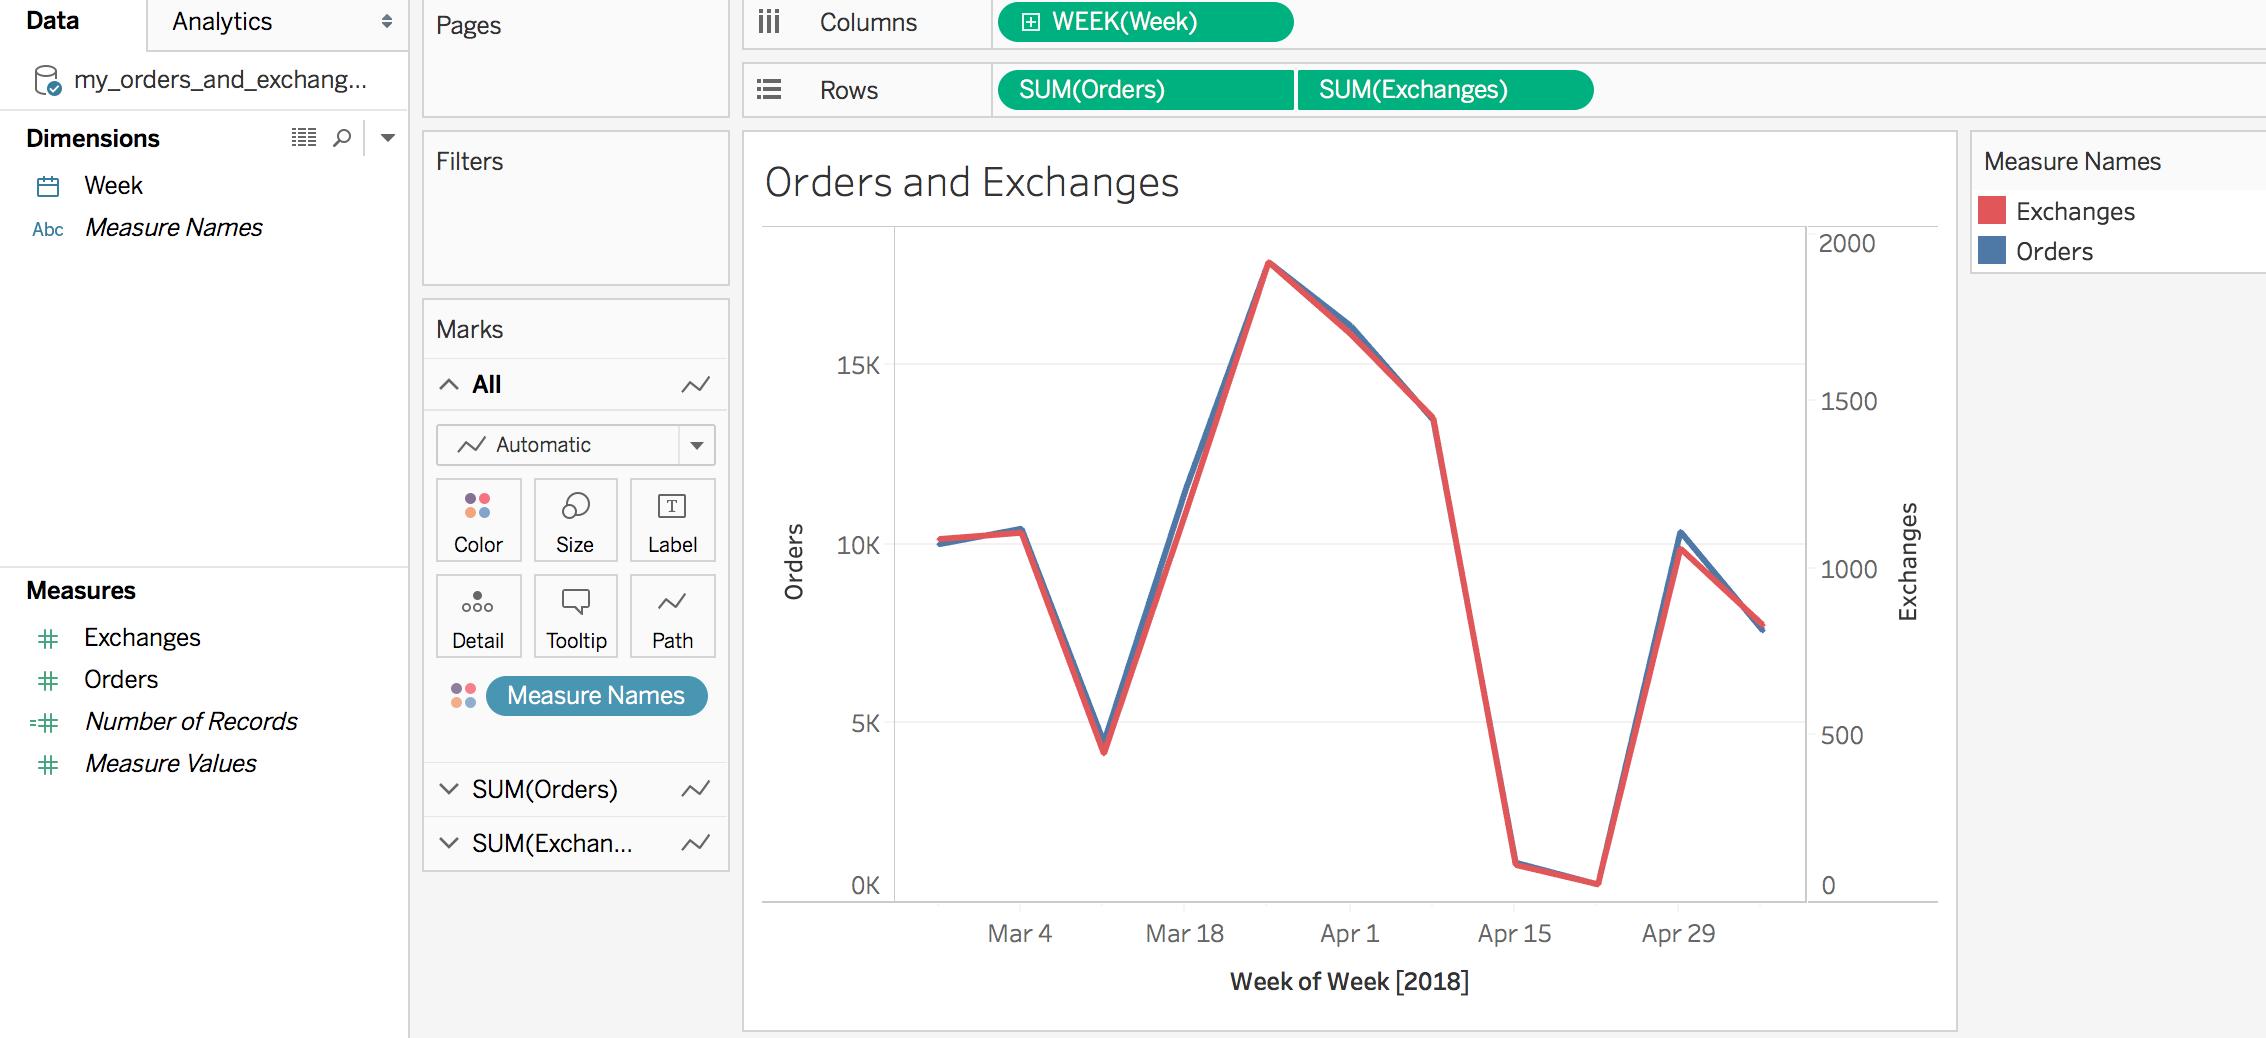 """Orders and Exchanges by Week"""